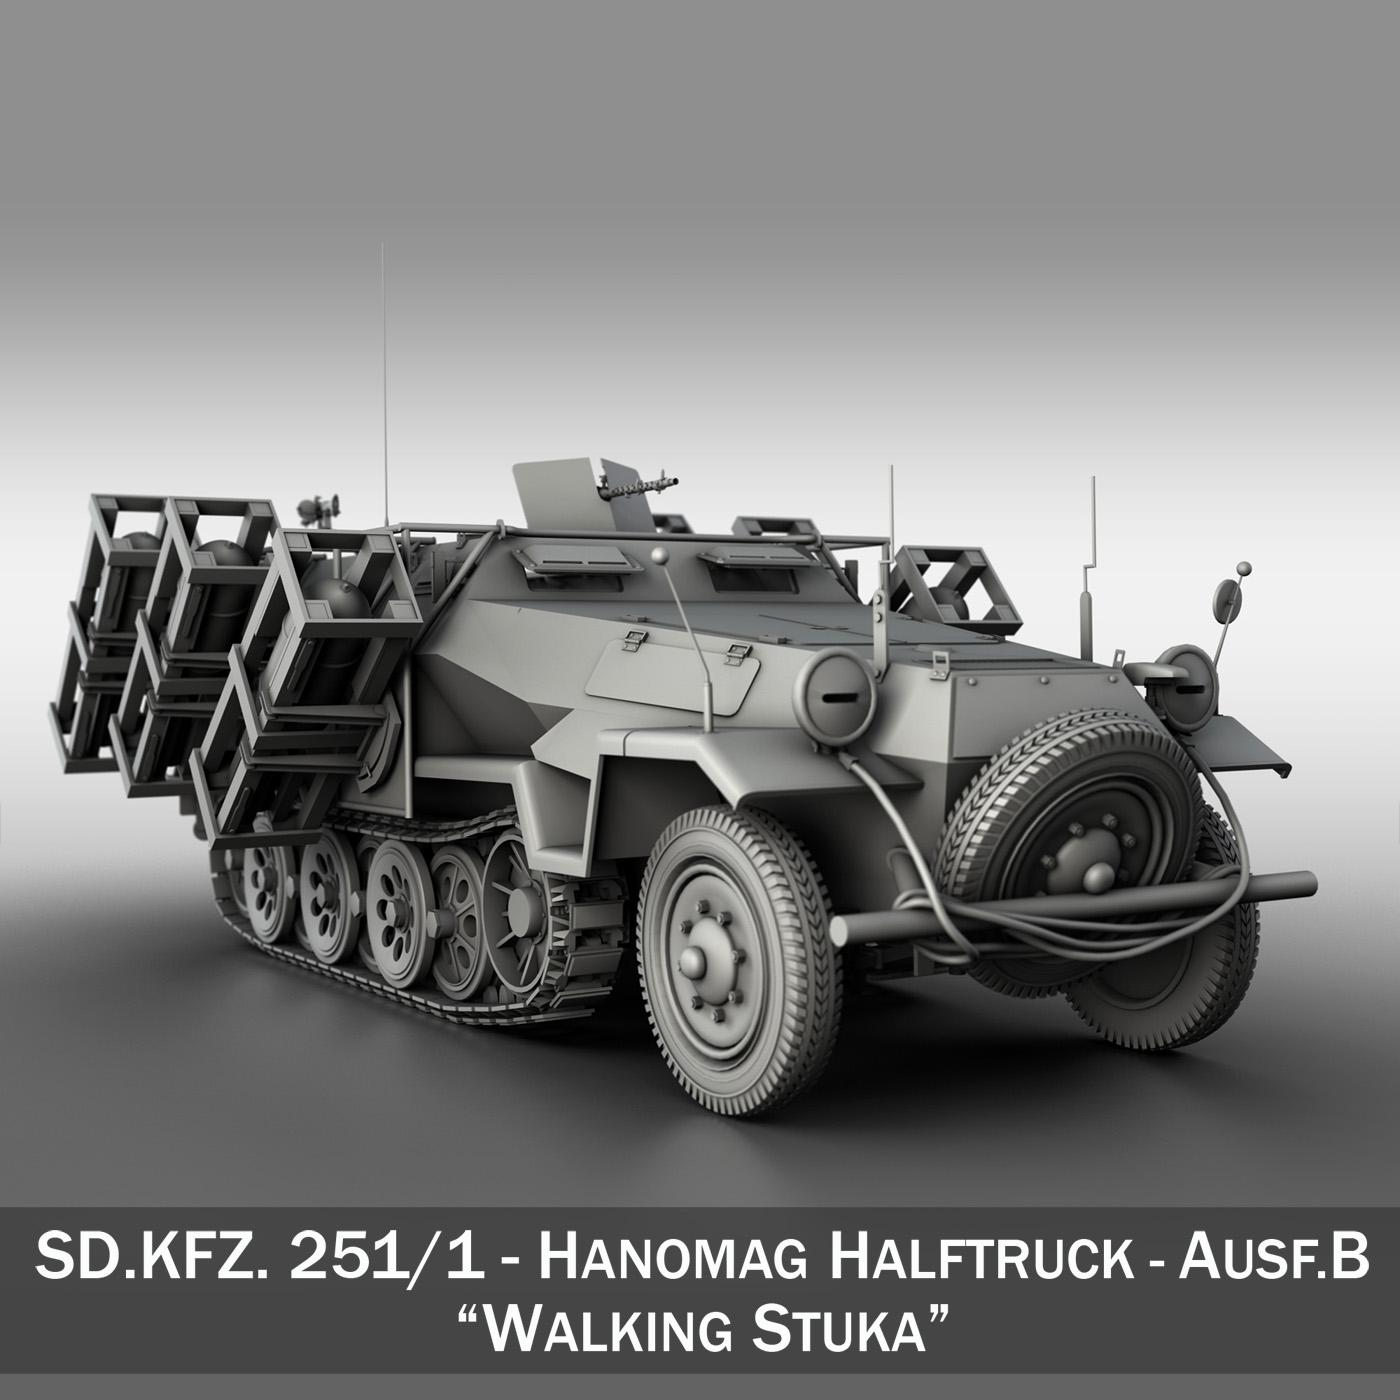 sdkfz 251 ausf.b – ground stuka 3d model 3ds fbx c4d lwo obj 251680